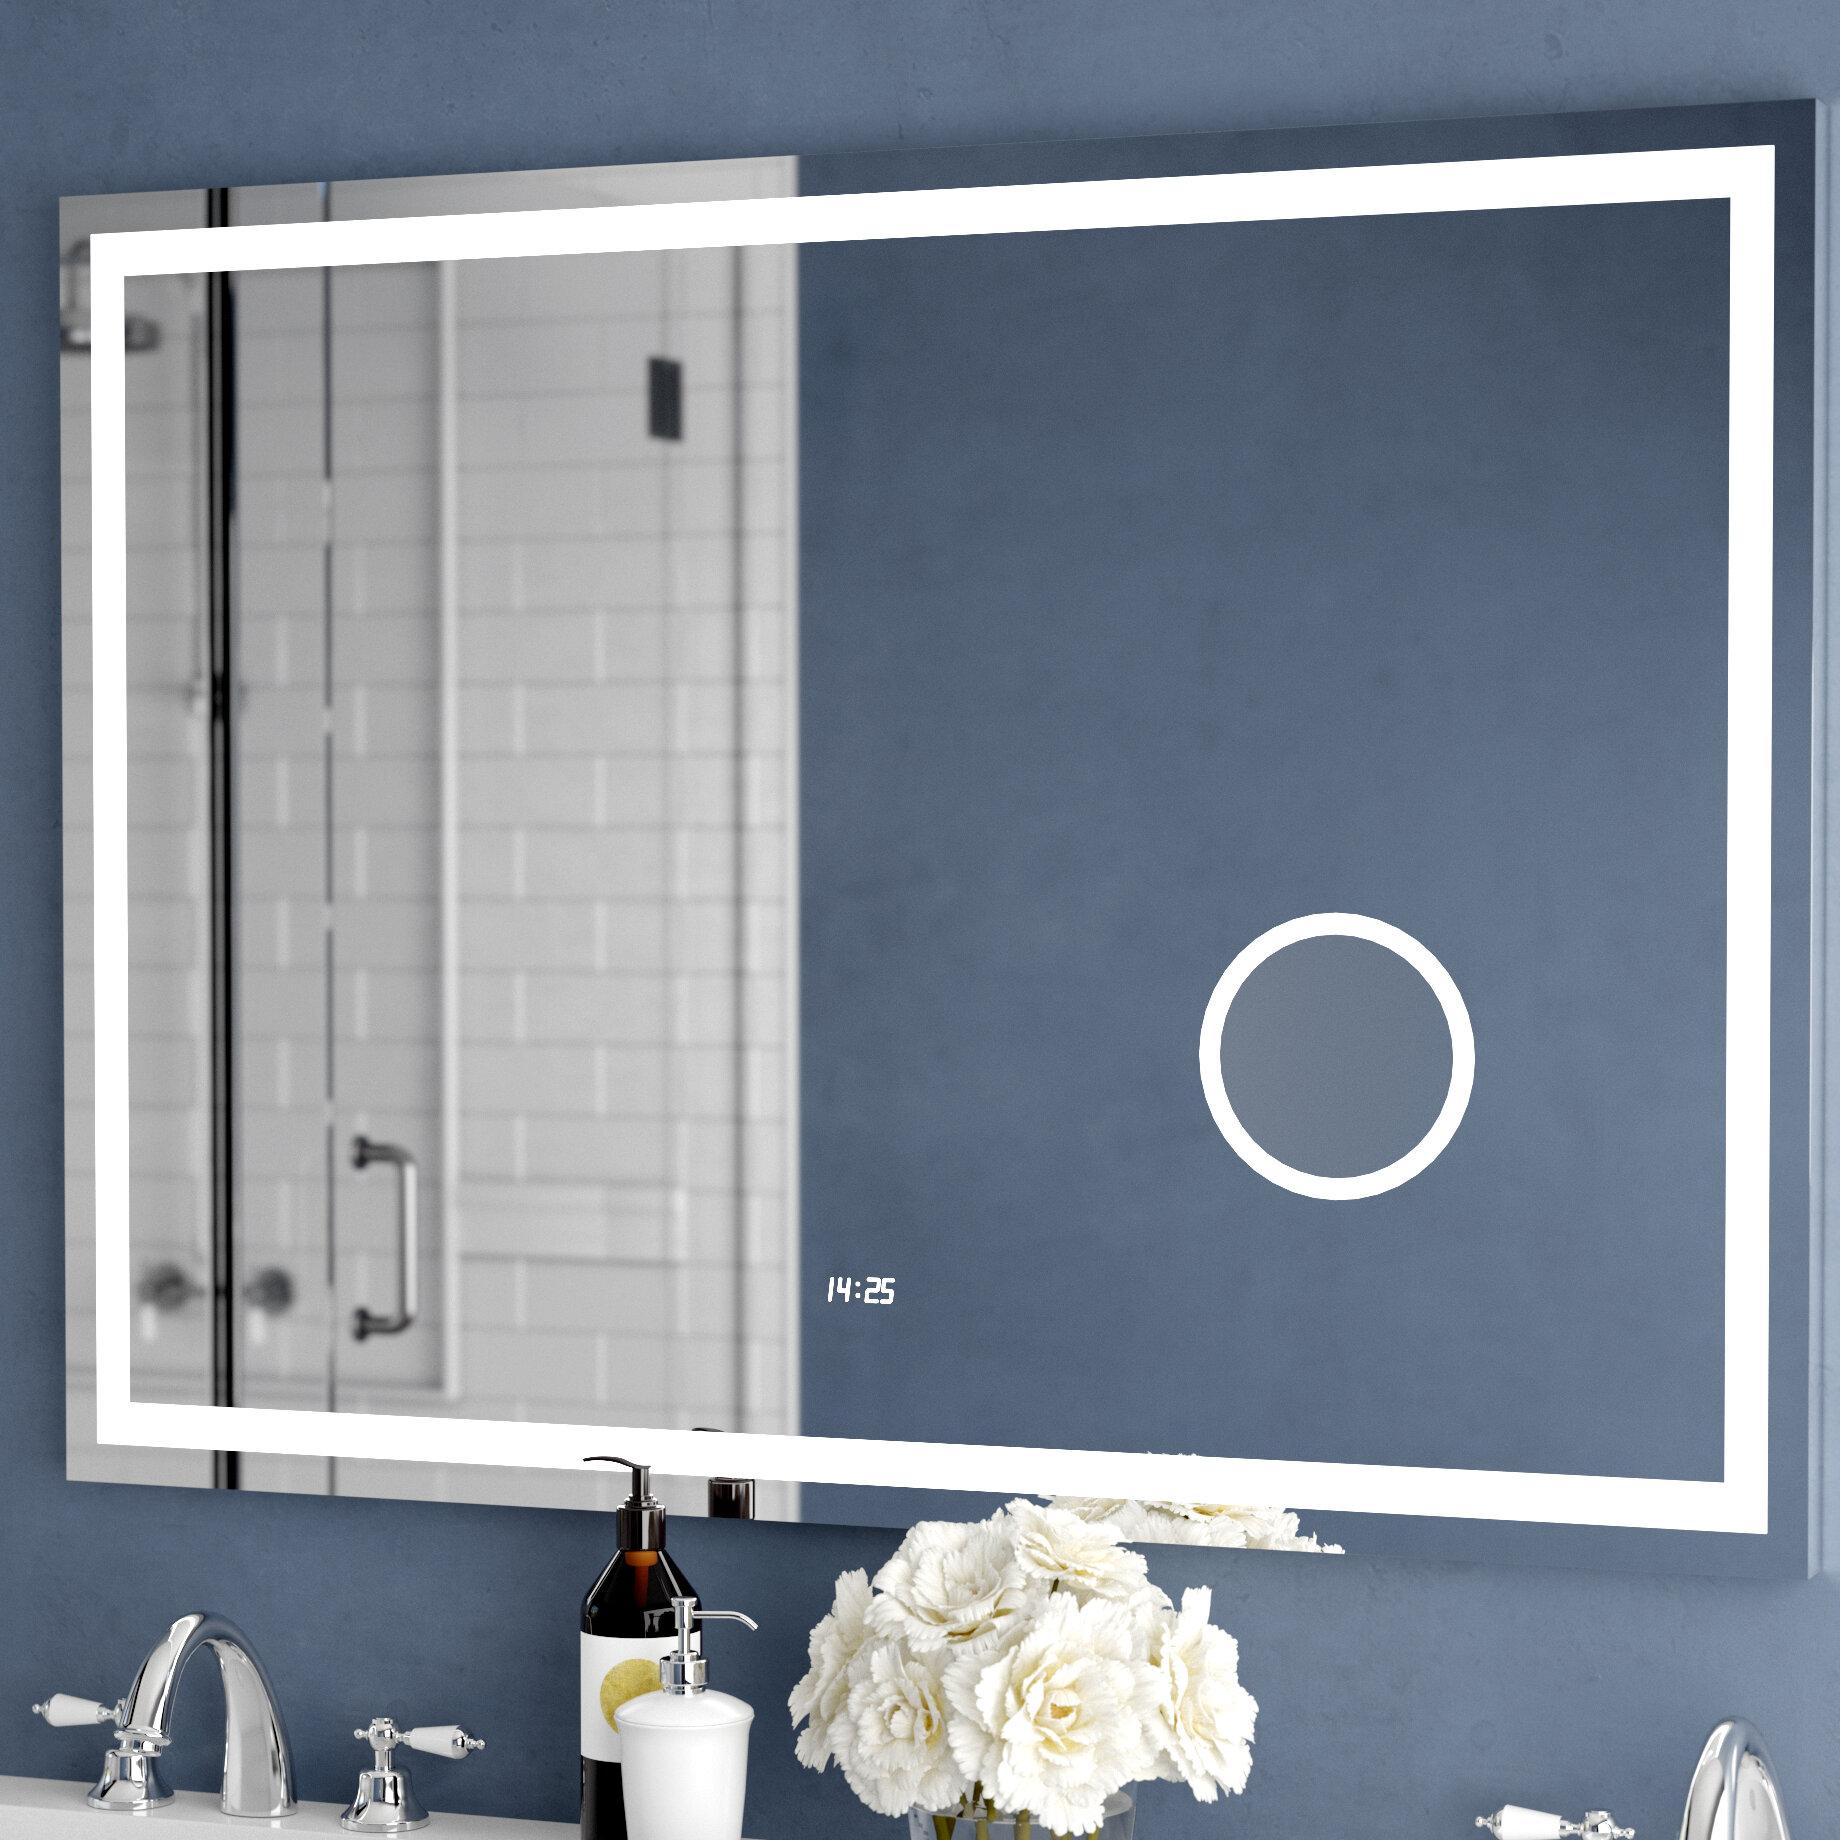 Fantastic Electric With Clock Bathroom Vanity Mirror Download Free Architecture Designs Viewormadebymaigaardcom